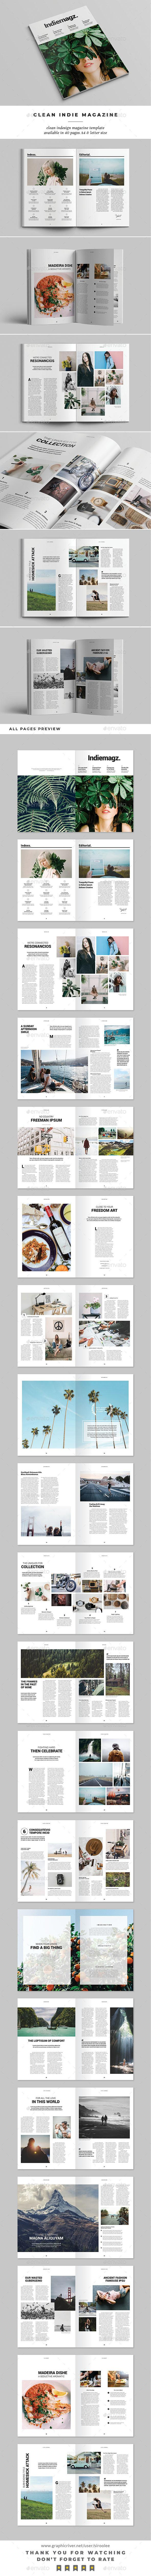 Clean Indie Magazine - Magazines Print Templates